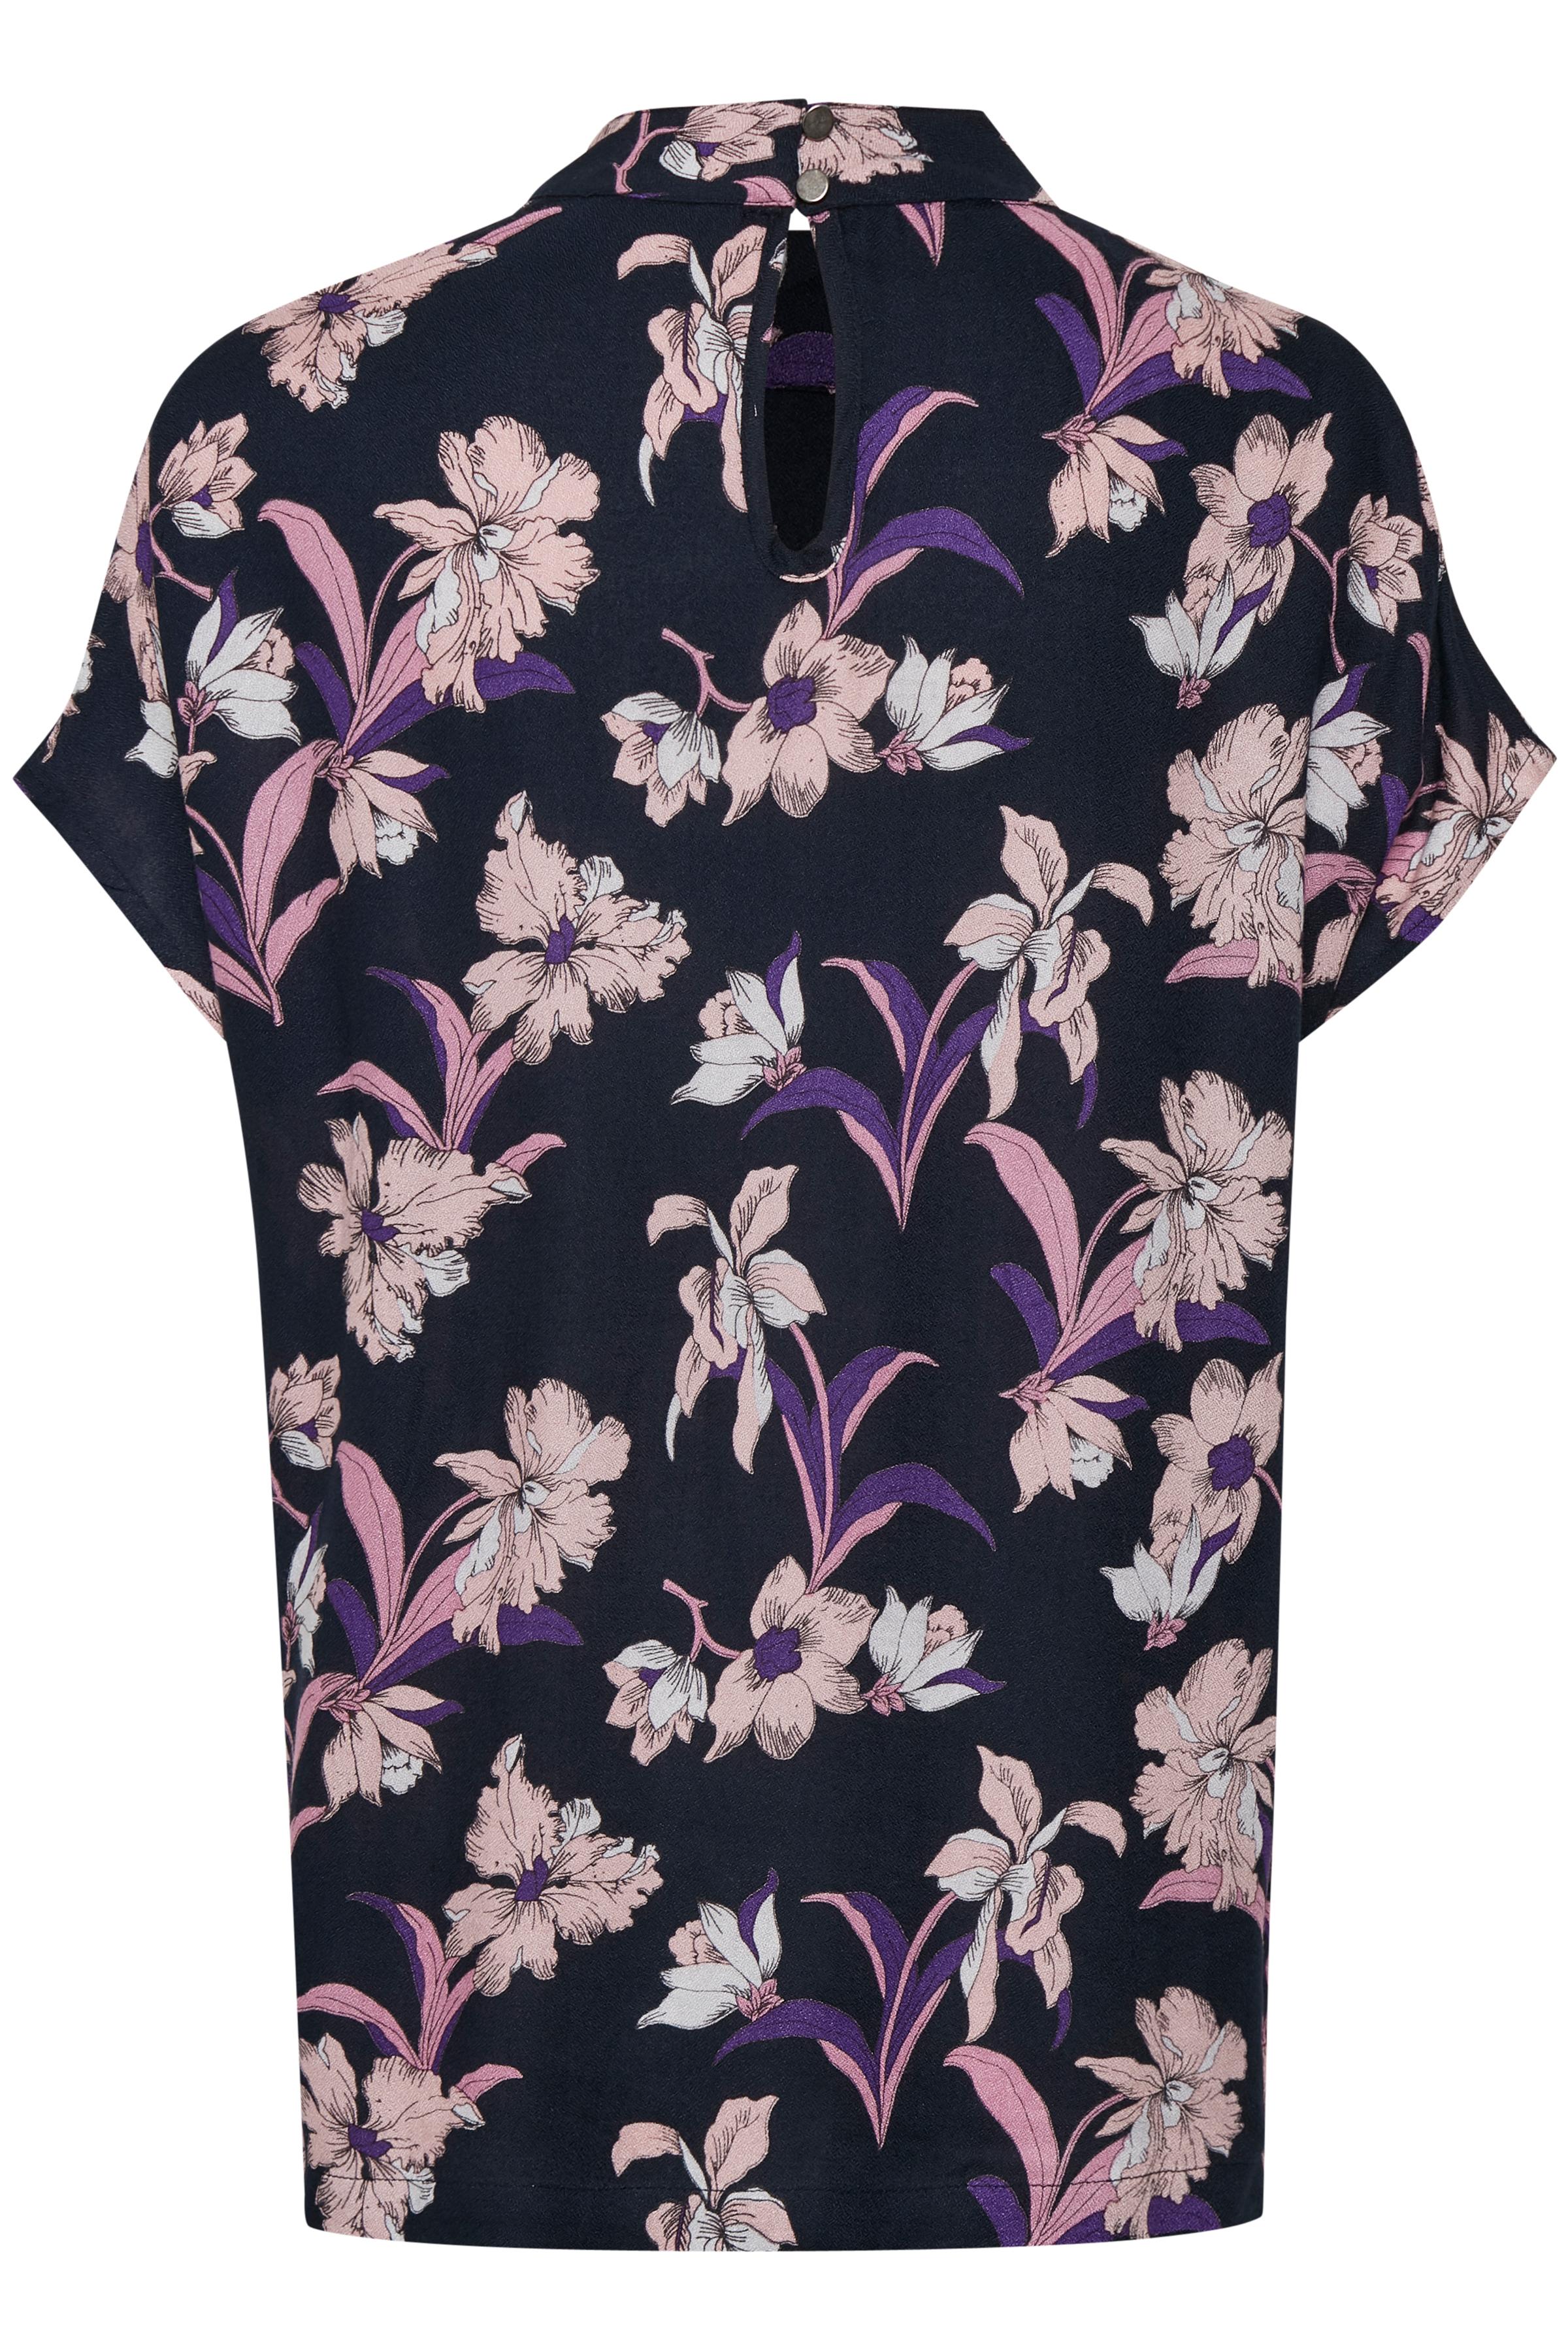 Marineblå/rosa Kortærmet bluse  fra Kaffe – Køb Marineblå/rosa Kortærmet bluse  fra str. 34-46 her